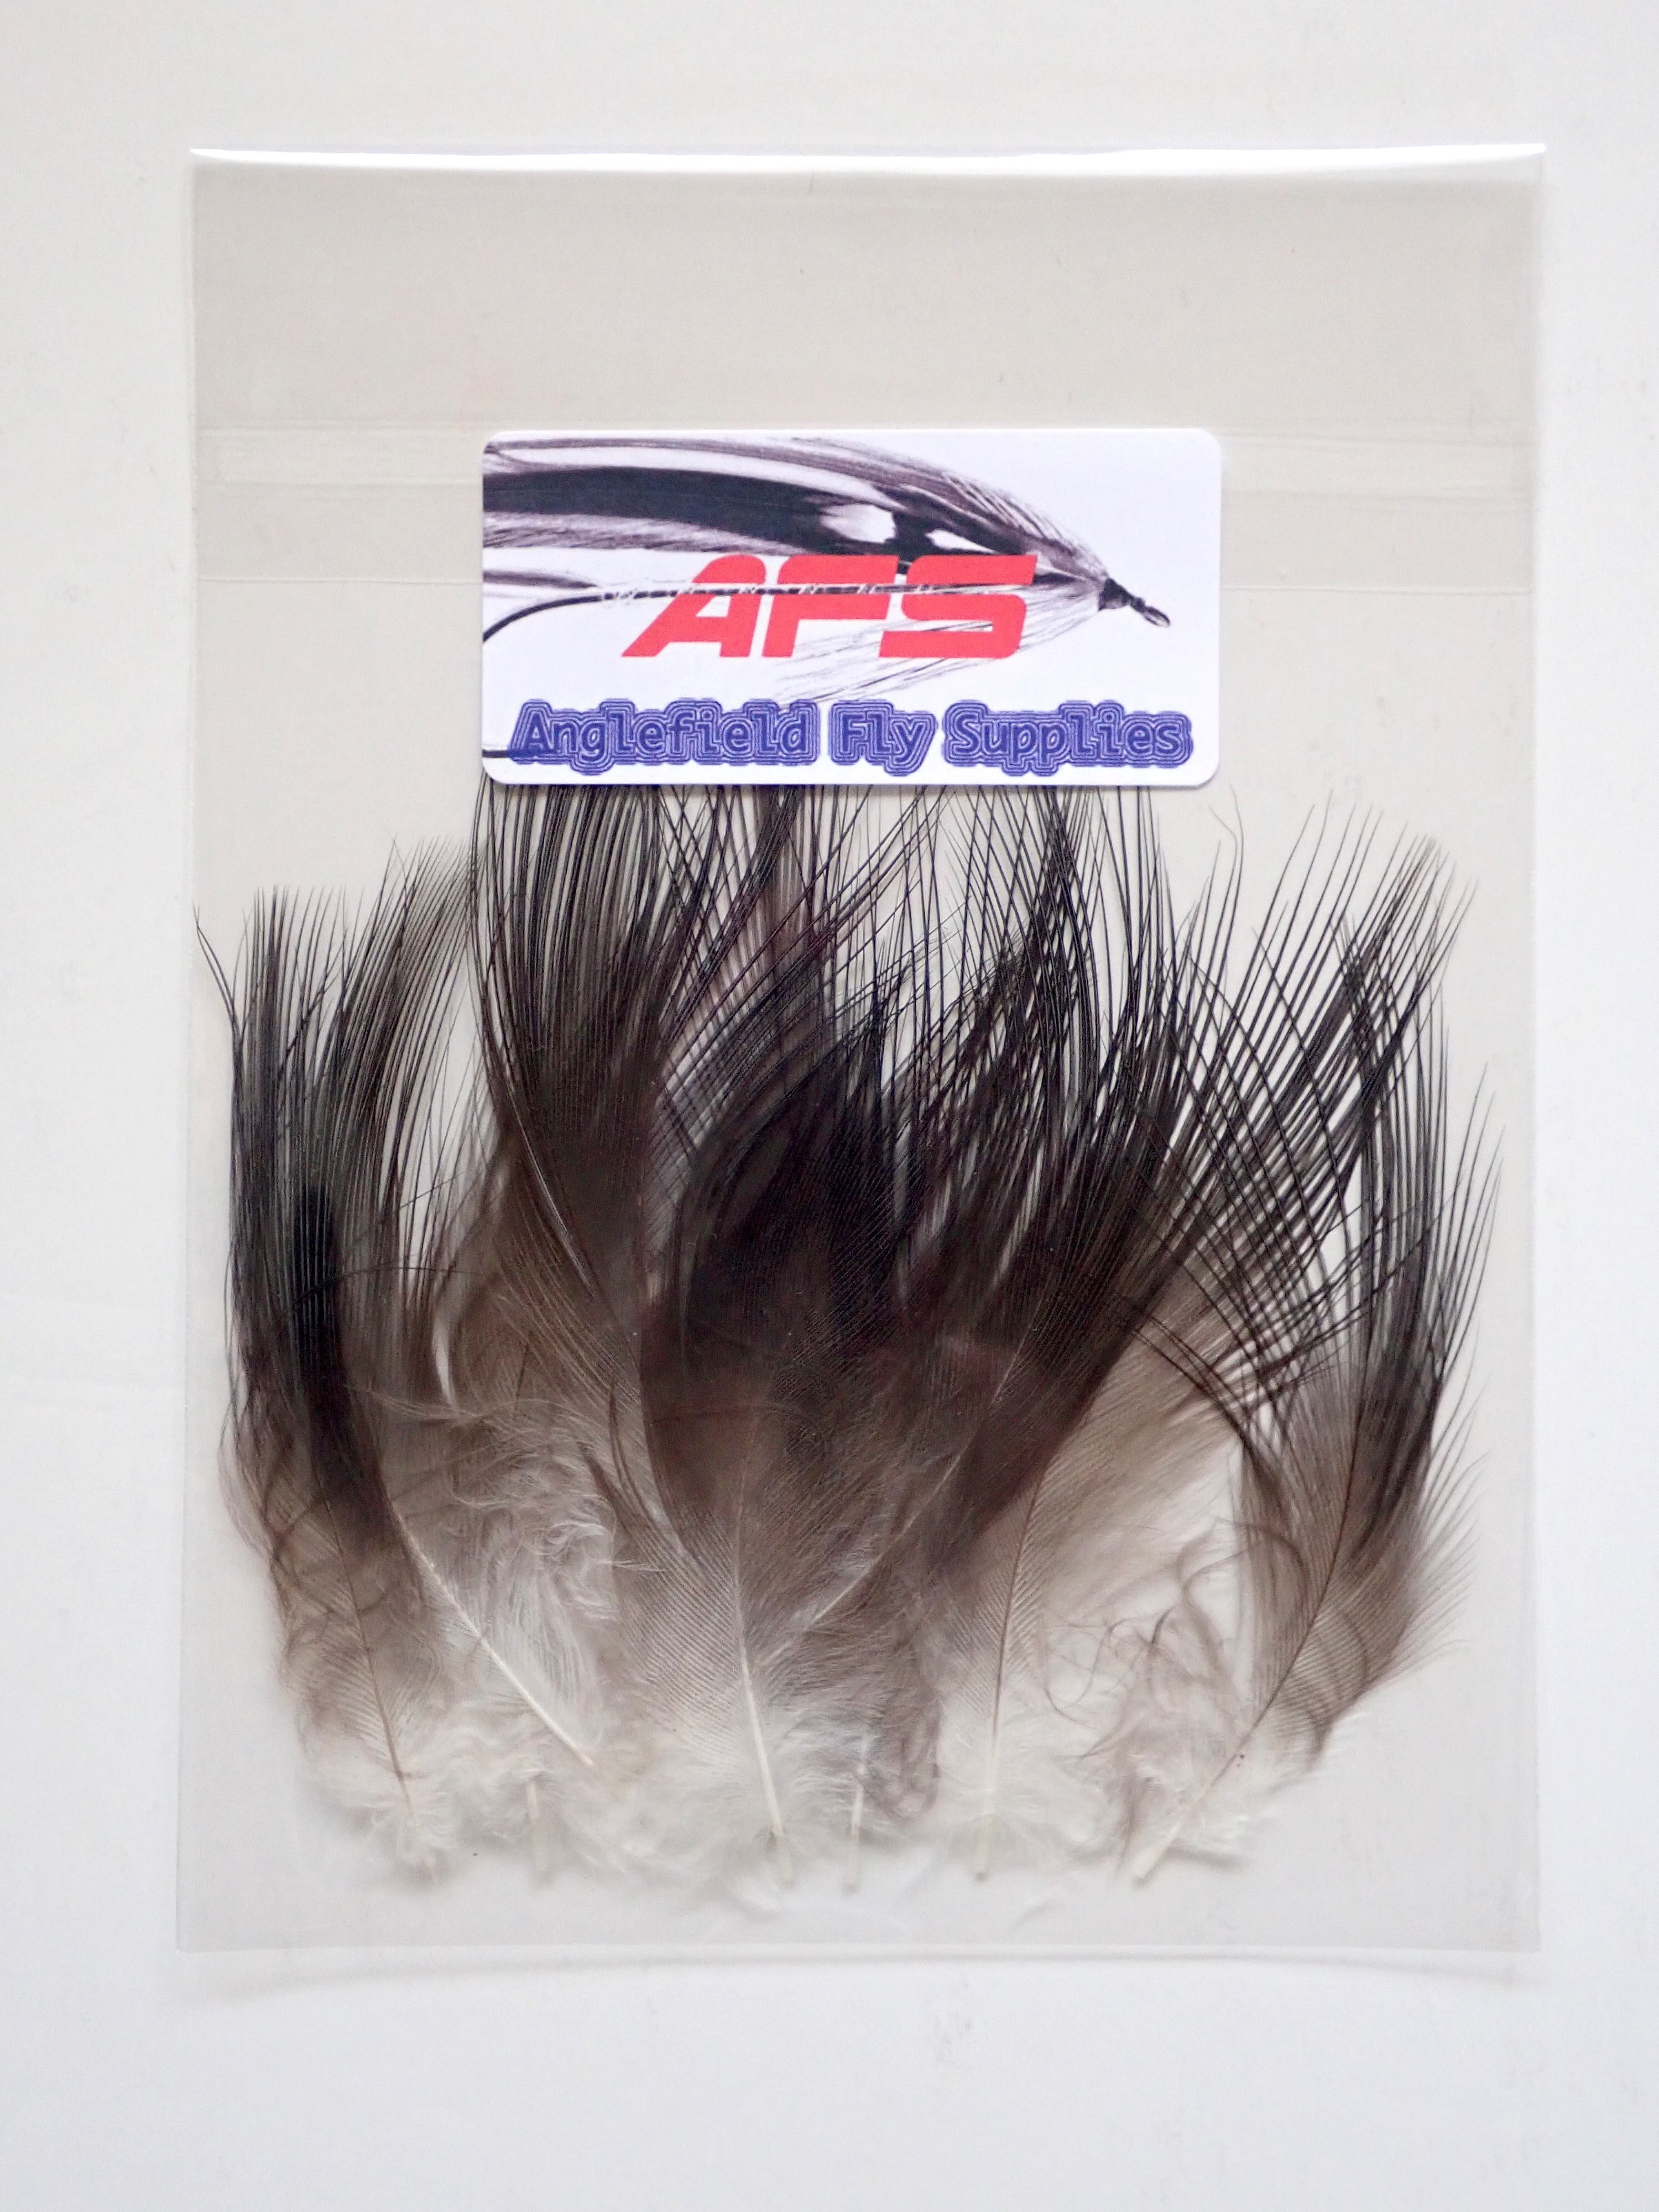 Black Heron 1.6-2.4inch / 4-6cm ブラックヘロン NTL Black